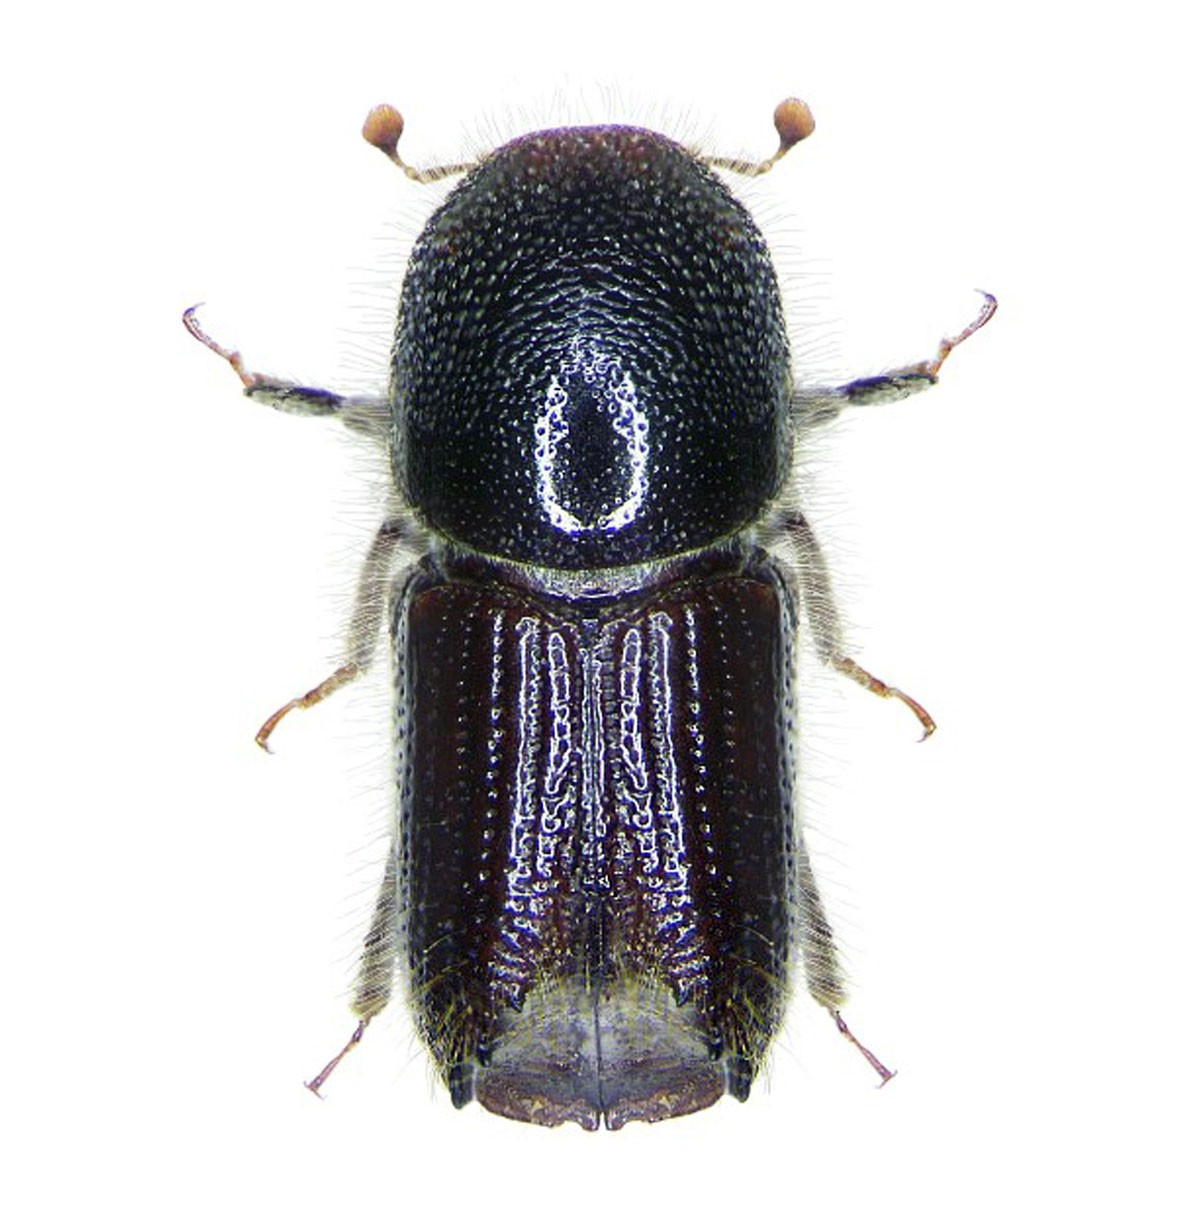 Ipsowit Standard, European spruce bark beetle (Ips typographus)